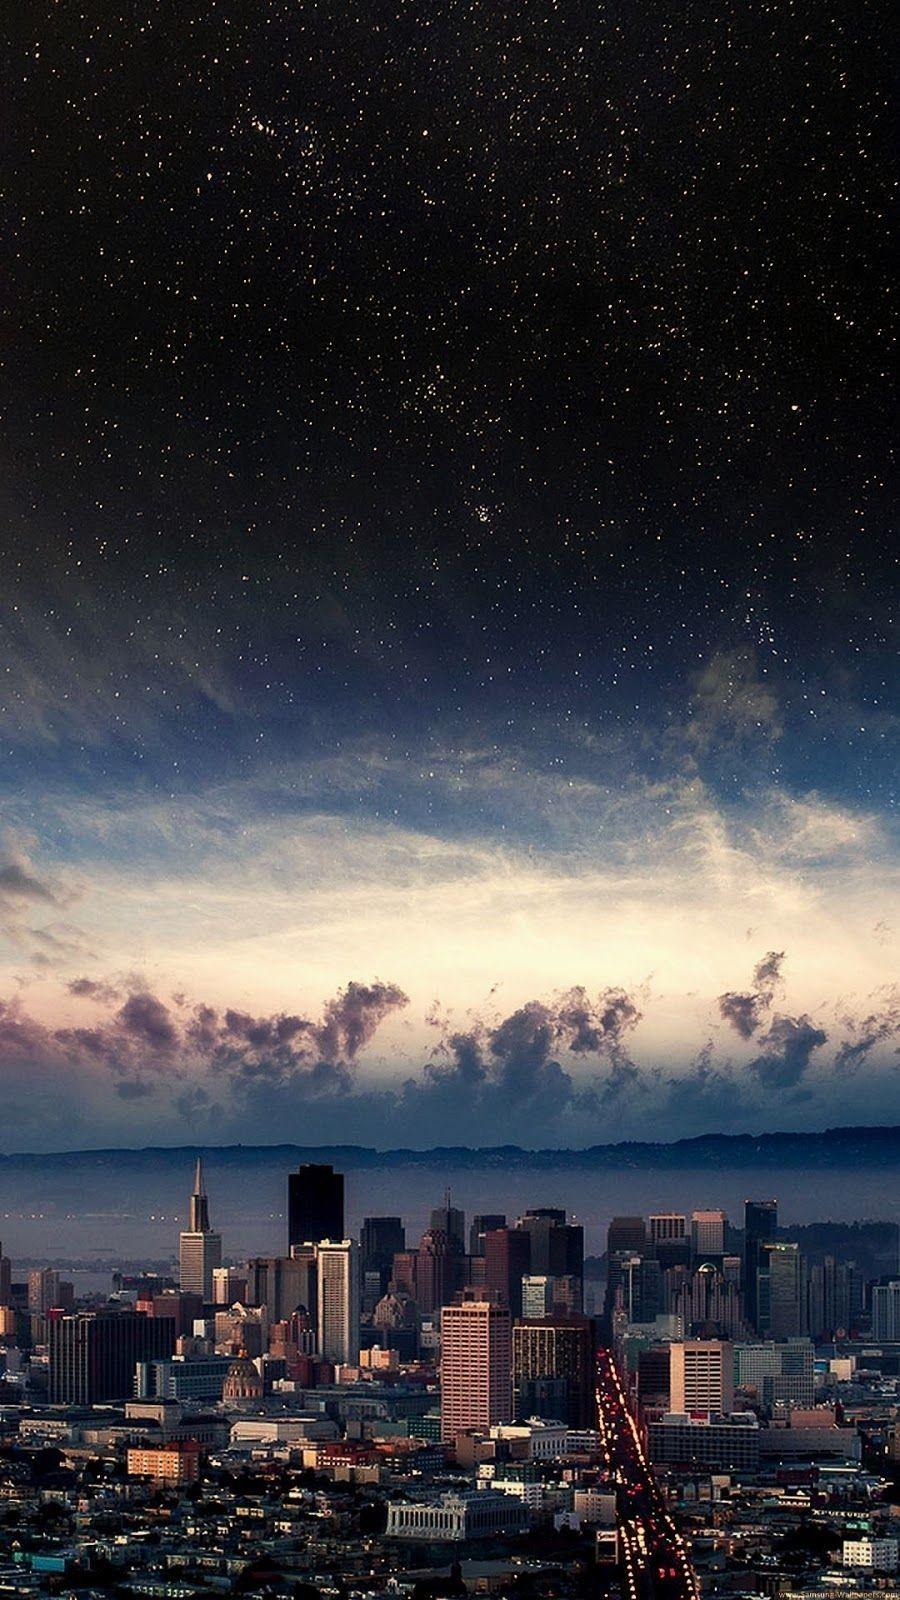 Pin By Bugu On Wallpaper View Wallpaper City Wallpaper Sky Aesthetic